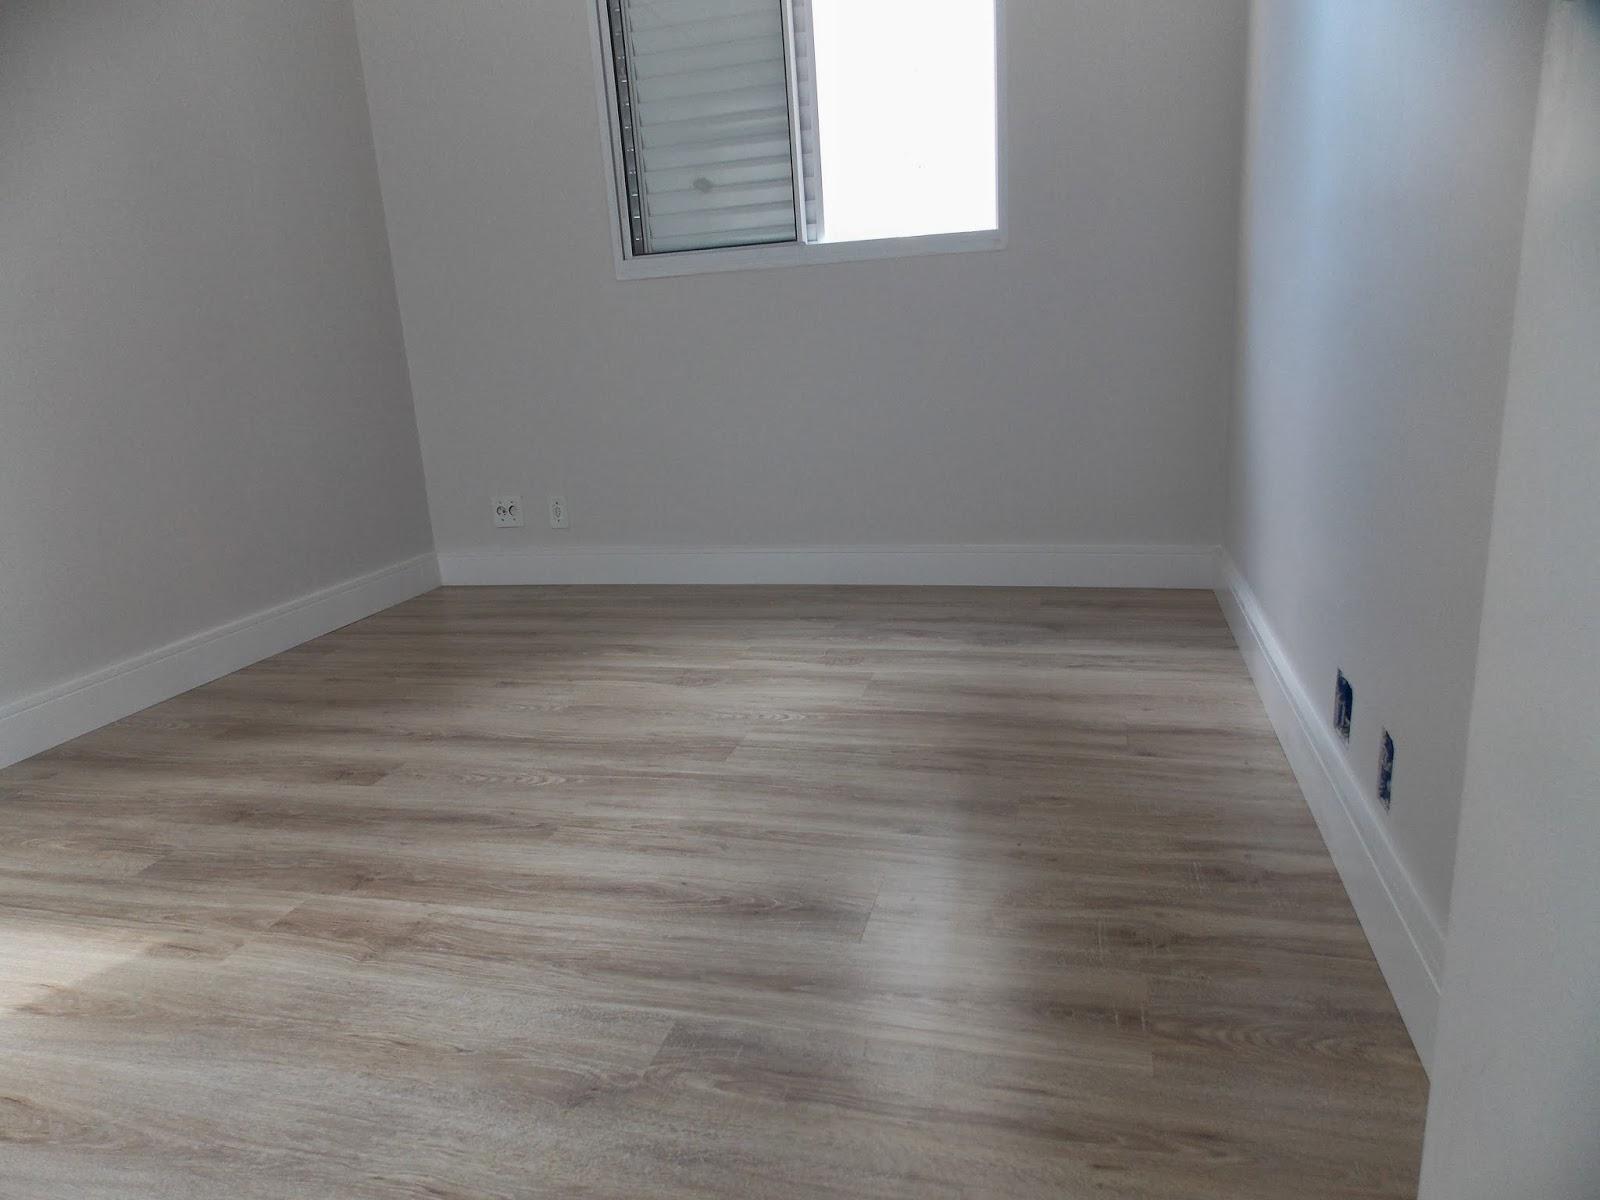 Loucos do 14 nosso piso laminado - Fotos de pisos decorados ...